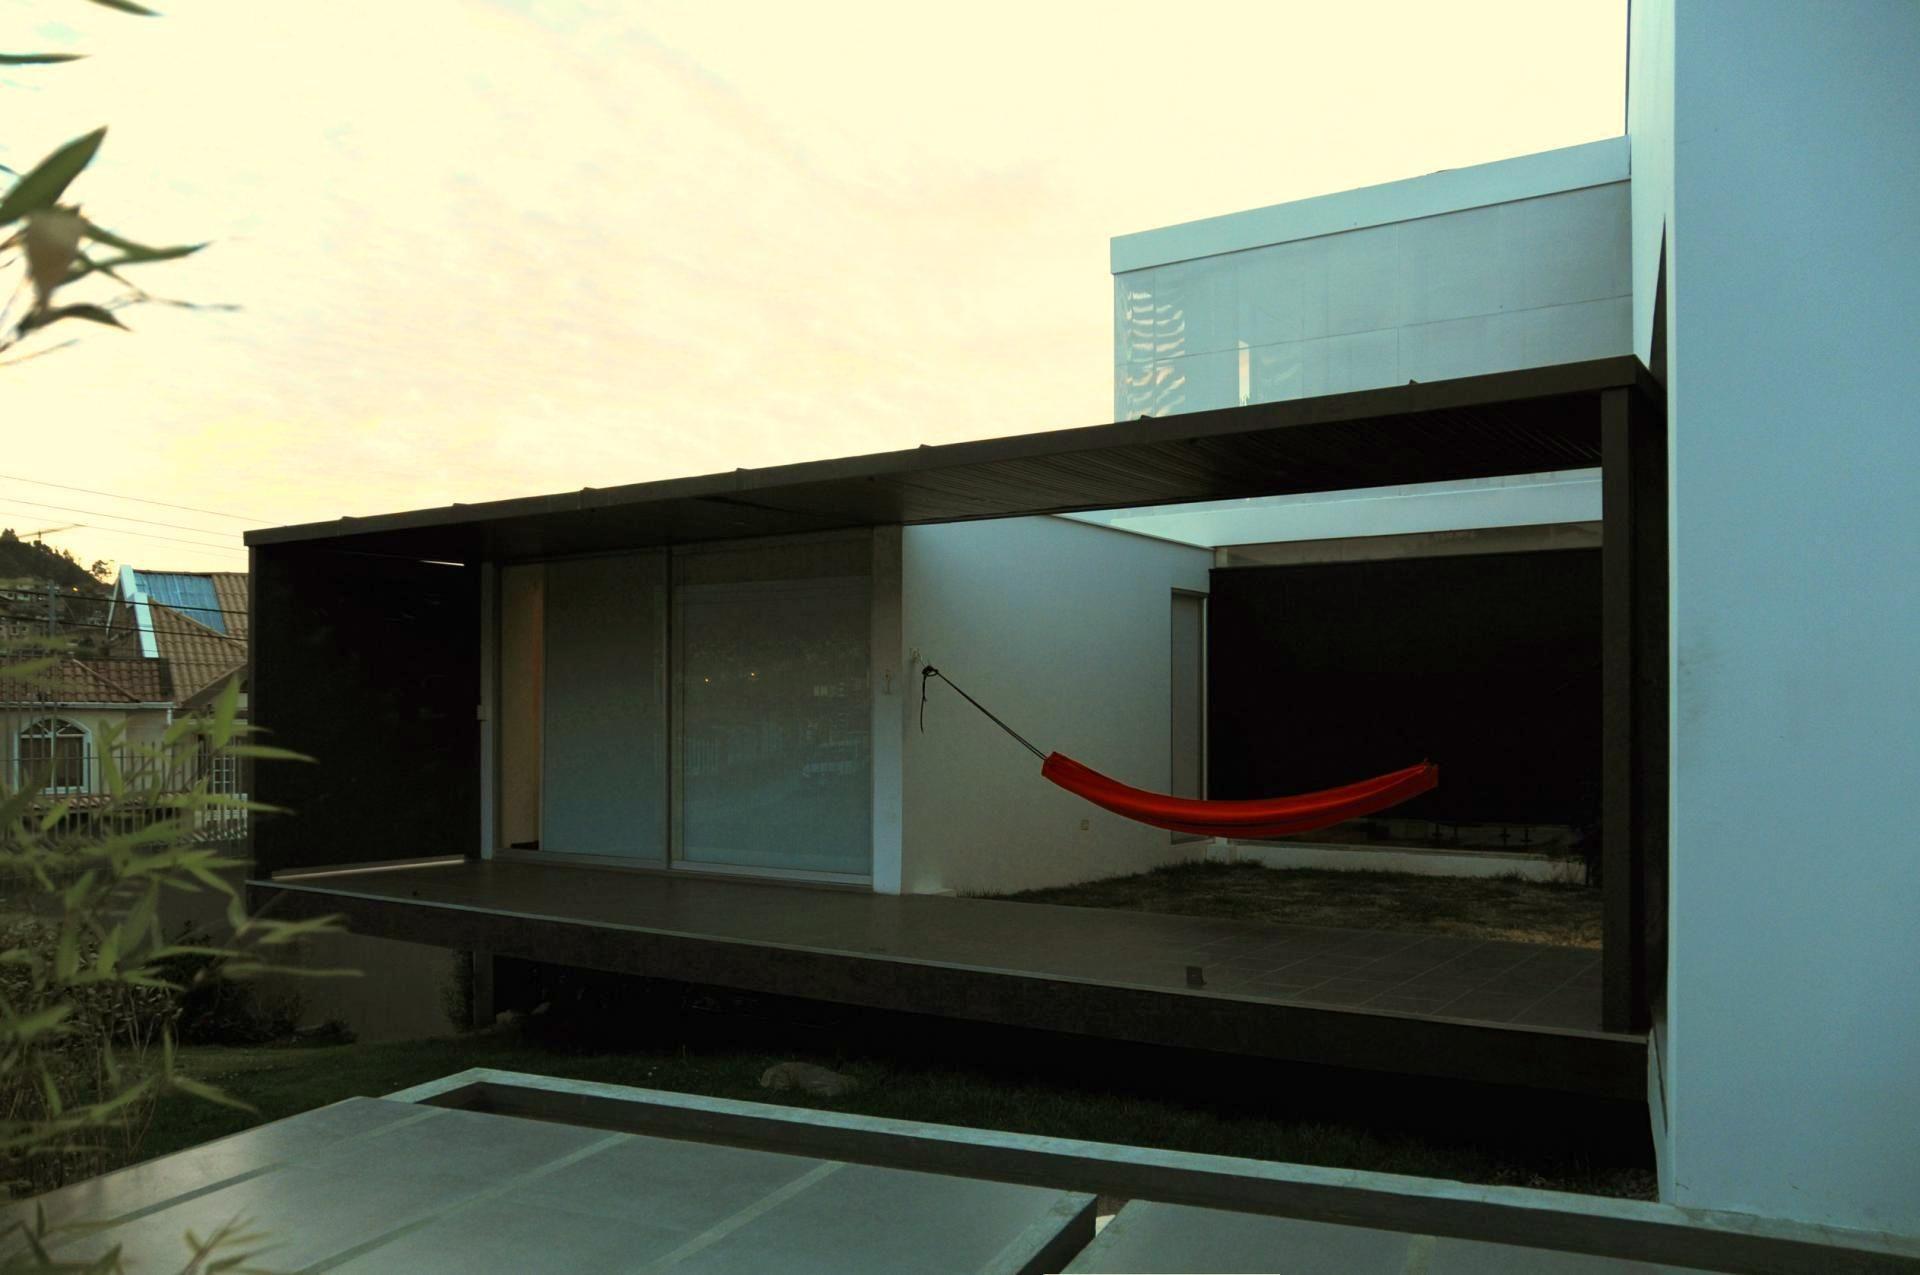 Casa Córdova Díaz designed by Espinoza Carvajal on a corner plot in Loja Ecuador: http://www.archello.com/en/project/casa-córdova-díaz #Architecture #Design